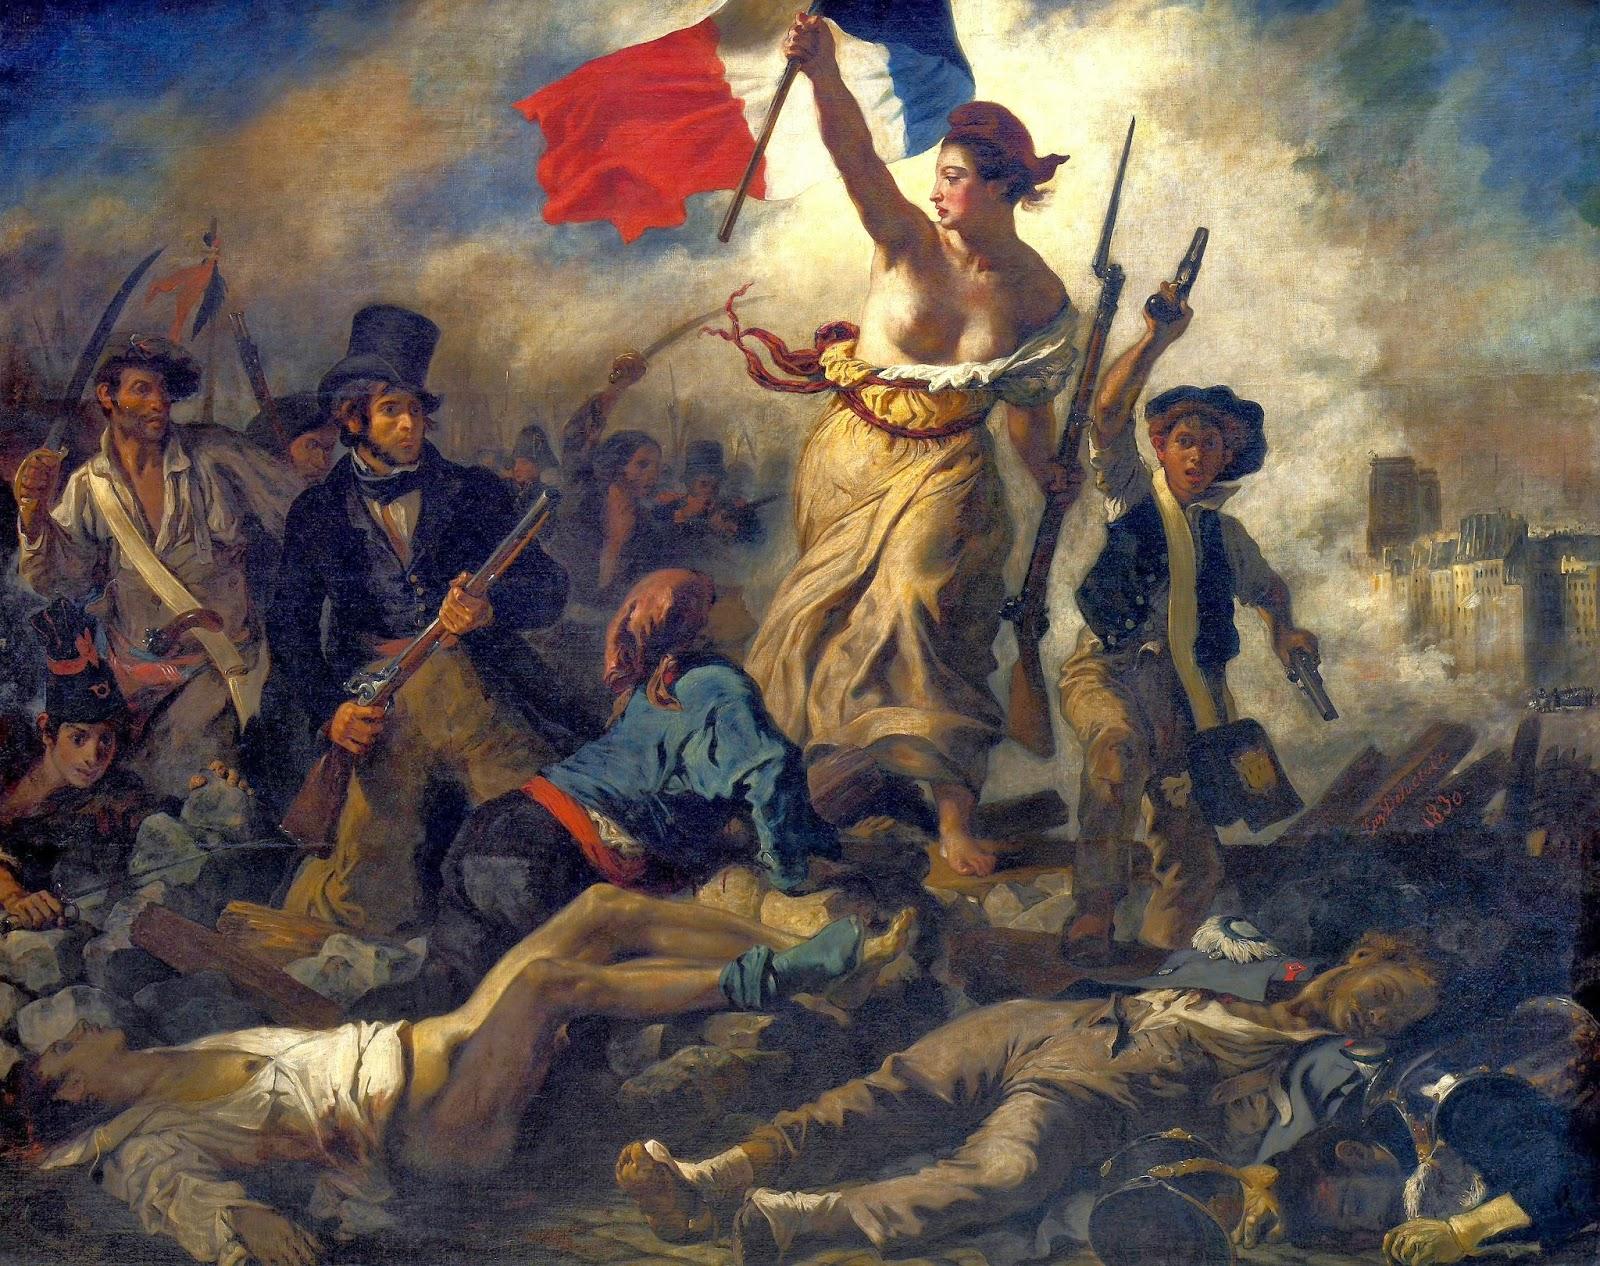 http://3.bp.blogspot.com/-jxNMwelIrhs/UnJrBYzOPdI/AAAAAAAAFYw/ctq5dnRdCkI/s1600/Derechos-fundamentales-revolucion-francesa.jpg